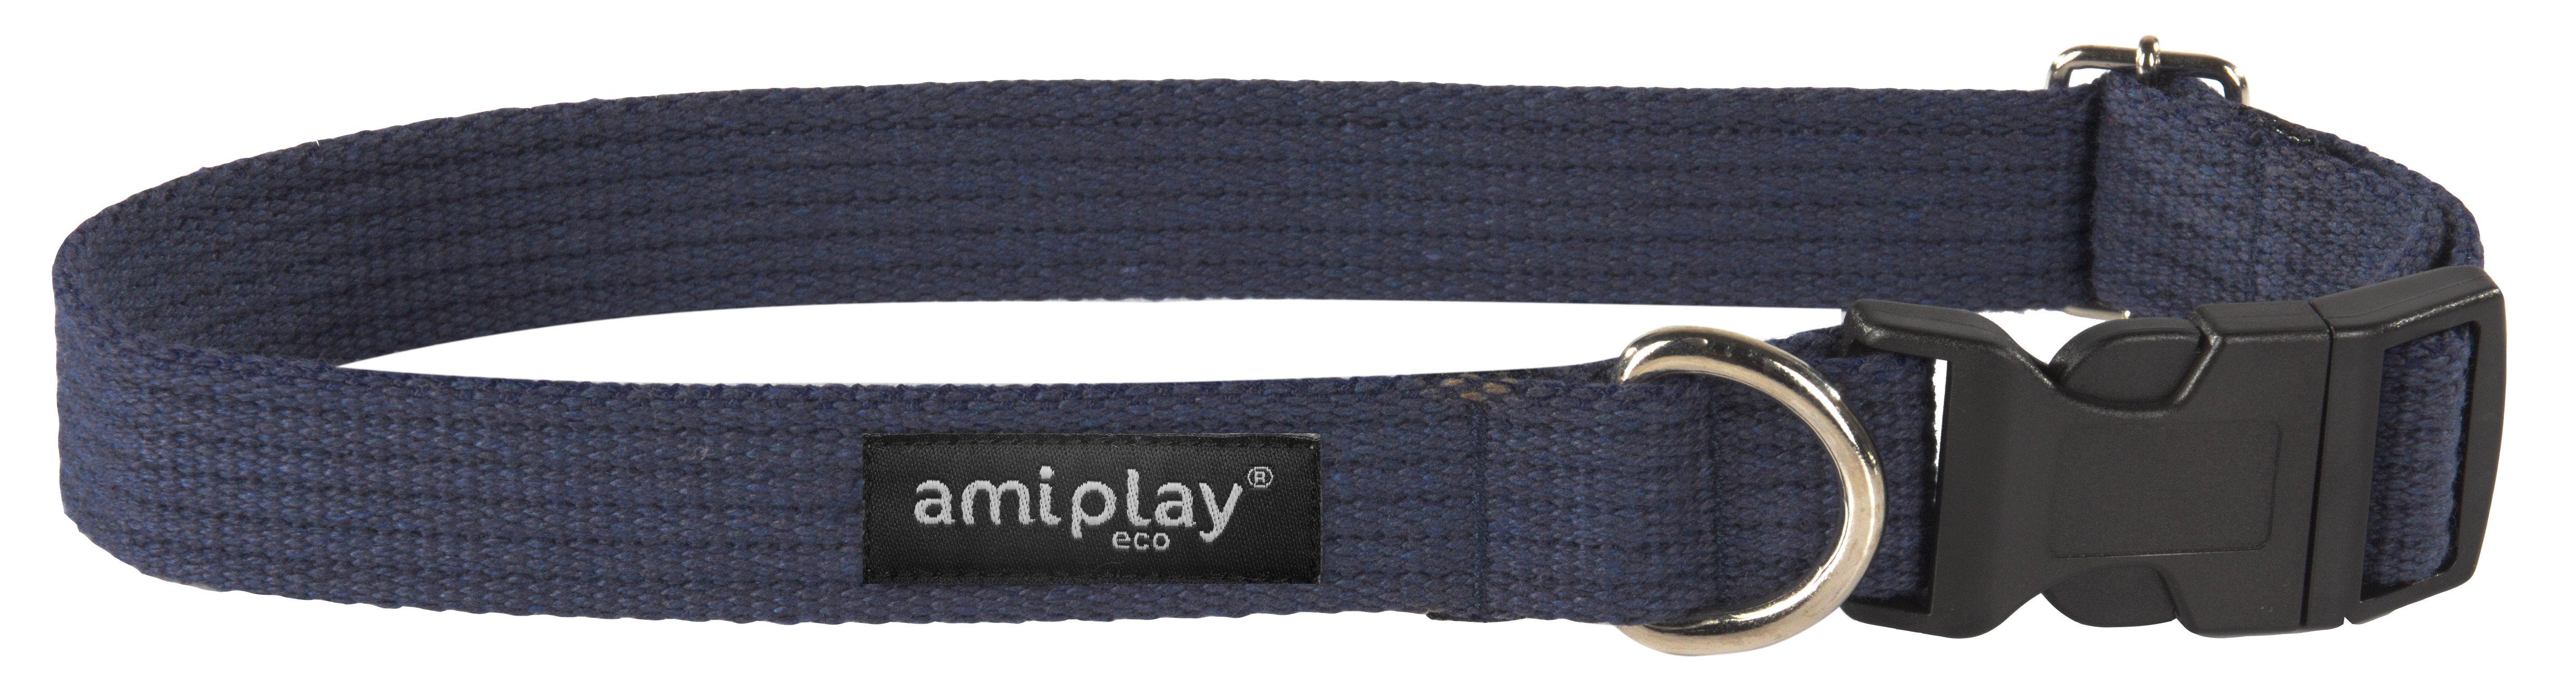 Amiplay medvilninis antkaklis, L, tamsiai mėlynas